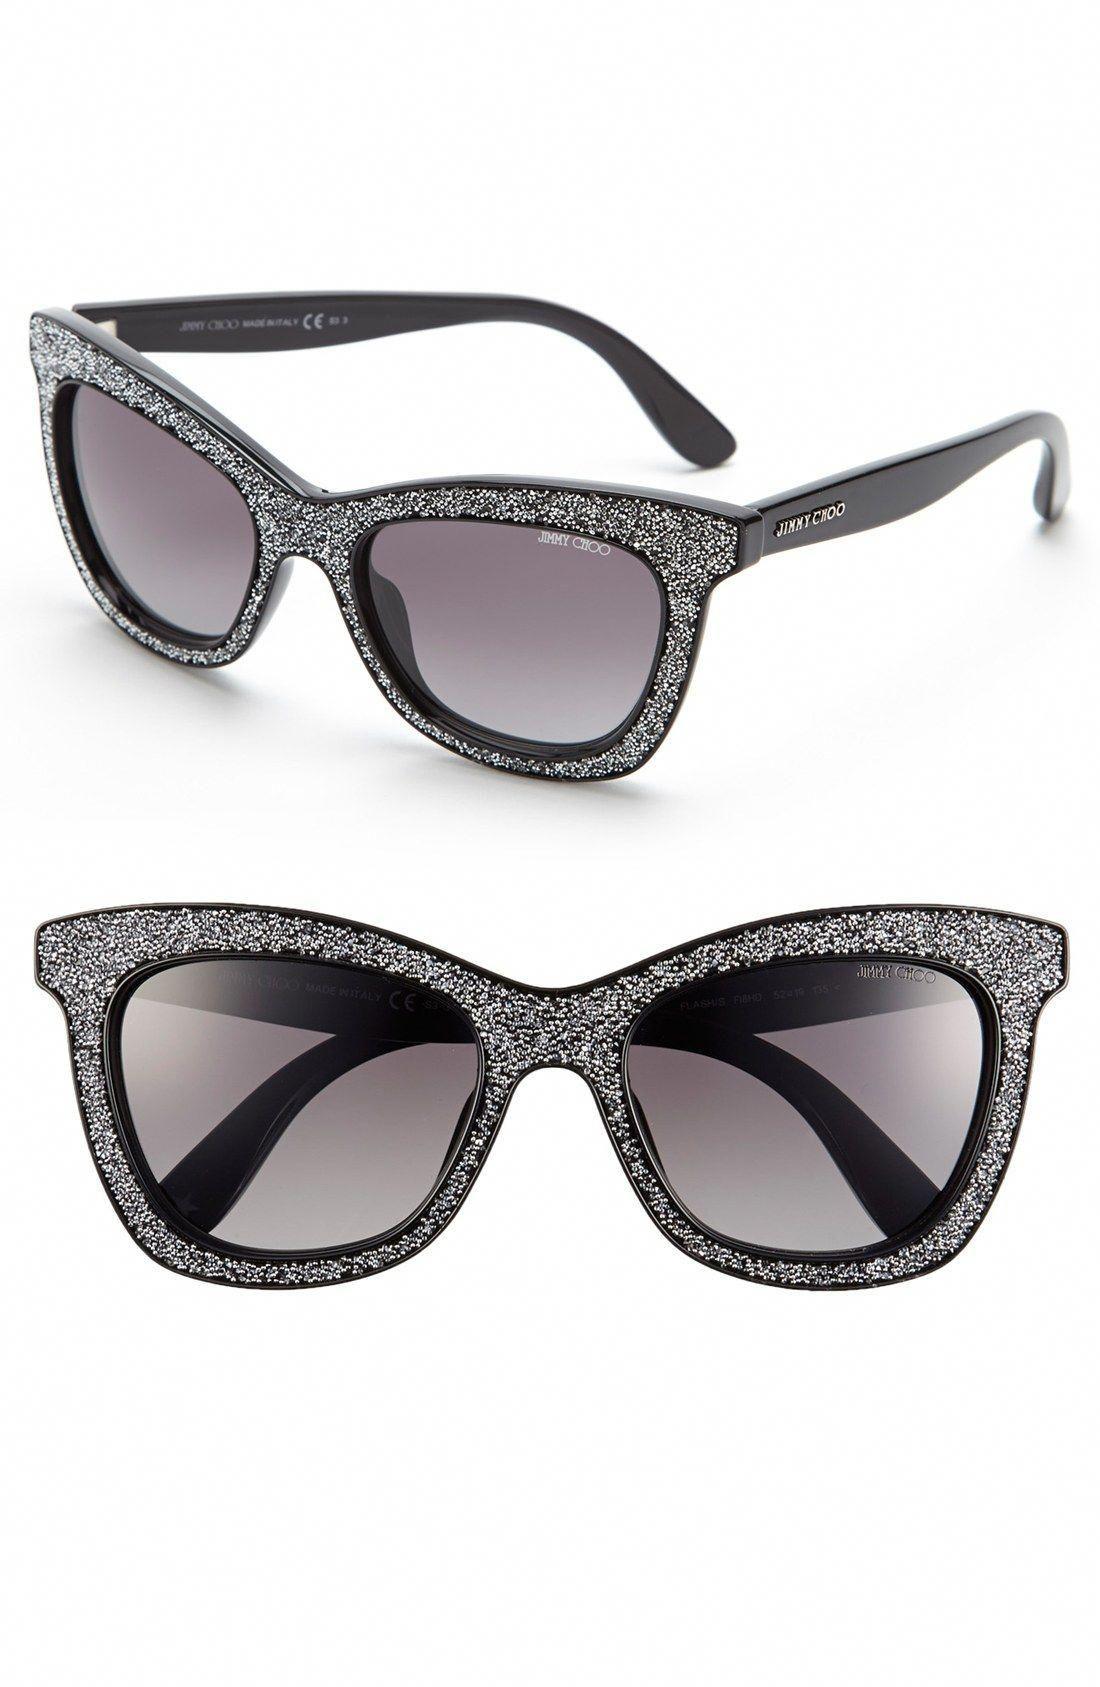 f5e05852bfa These sparkly